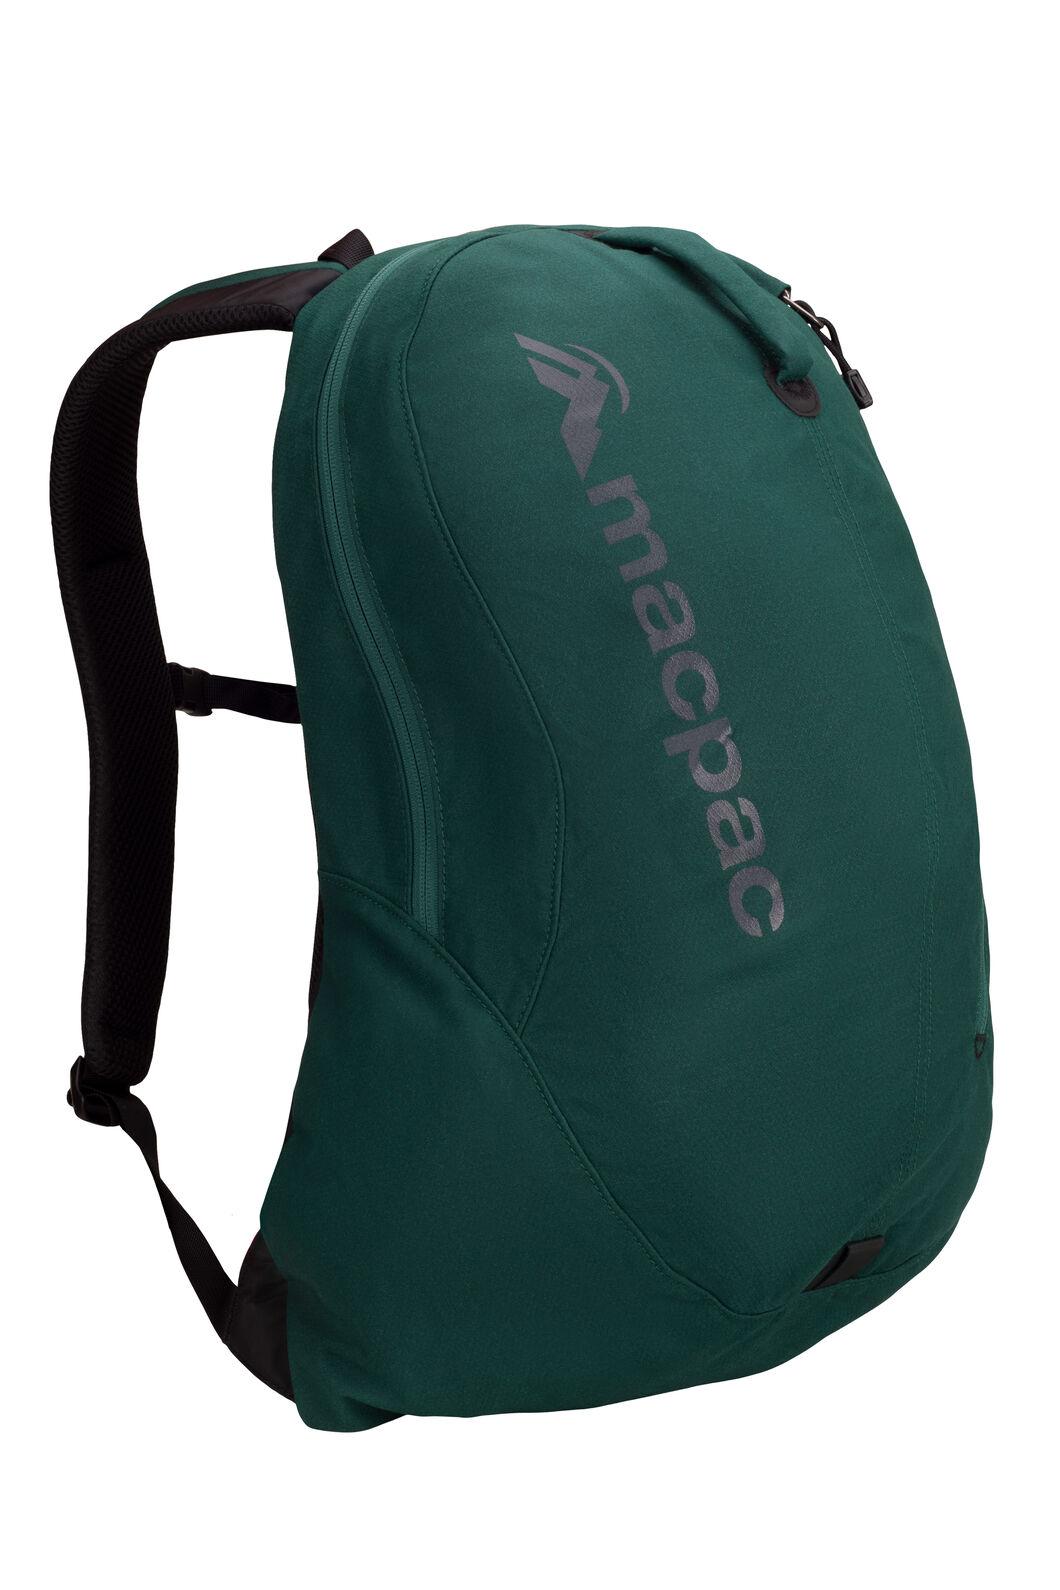 Macpac Kahu AzTec® 22L Backpack, Botanical Green/Black, hi-res